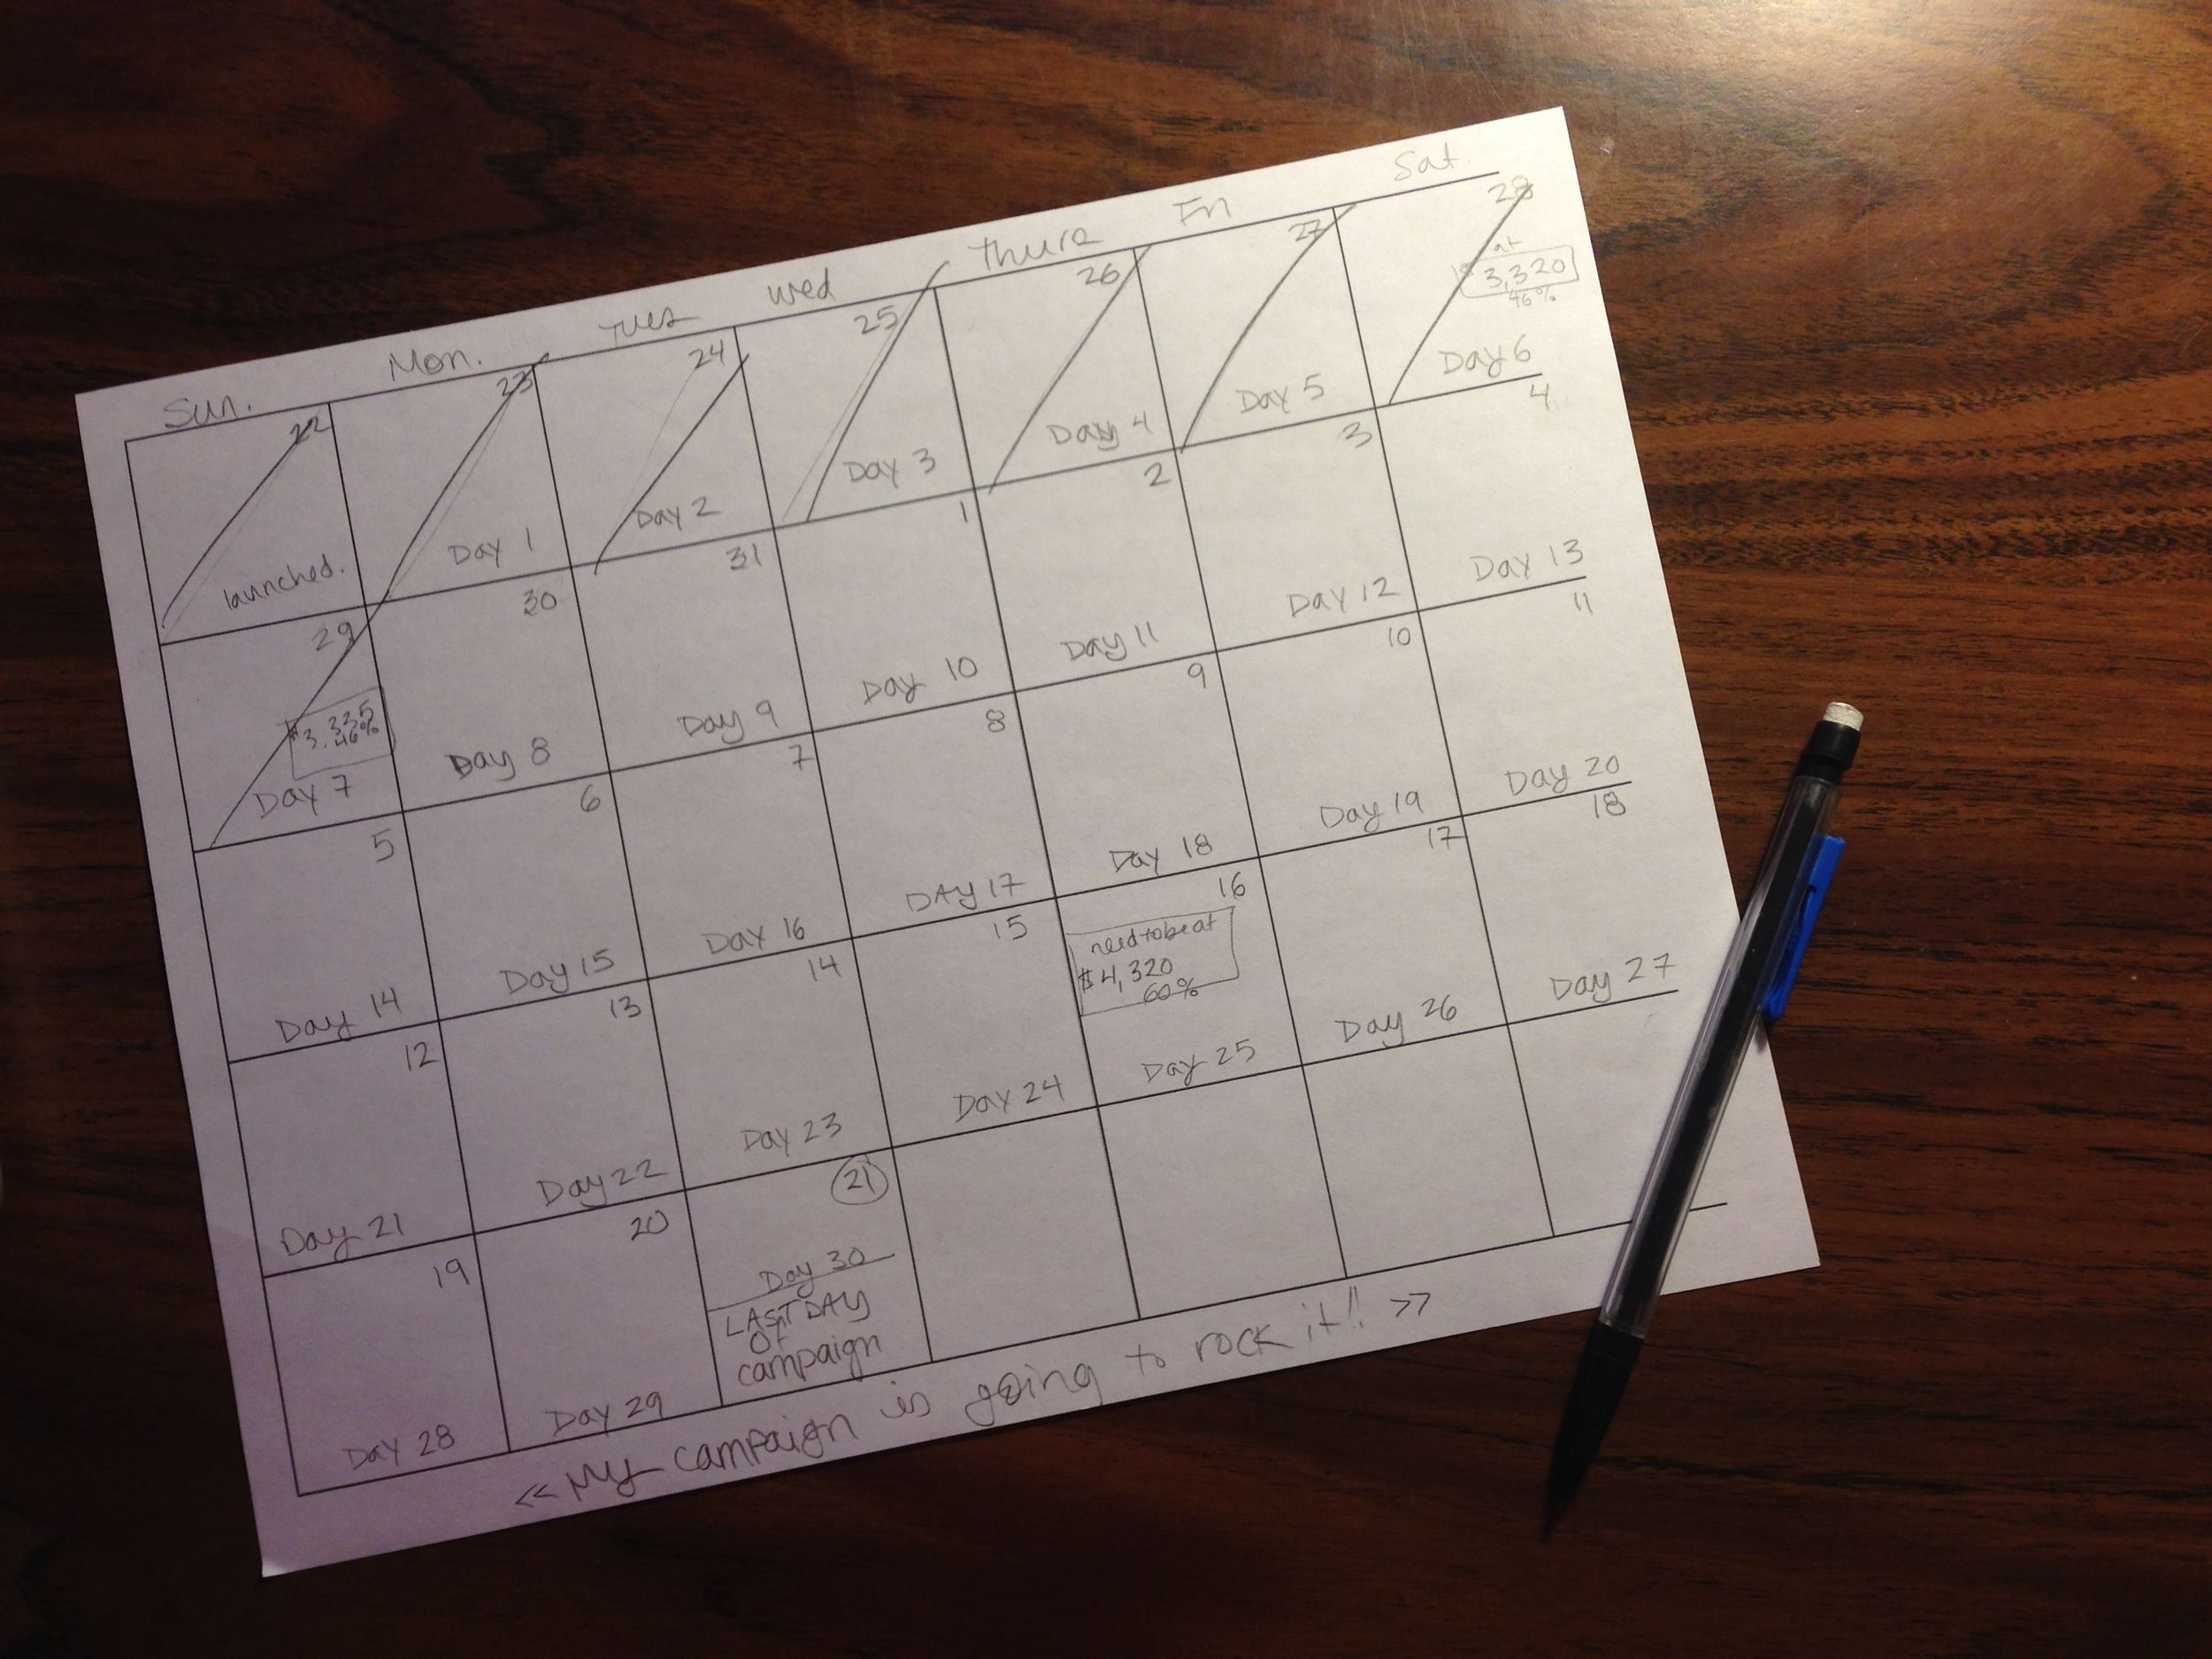 crowdfunding_campaign_calendar